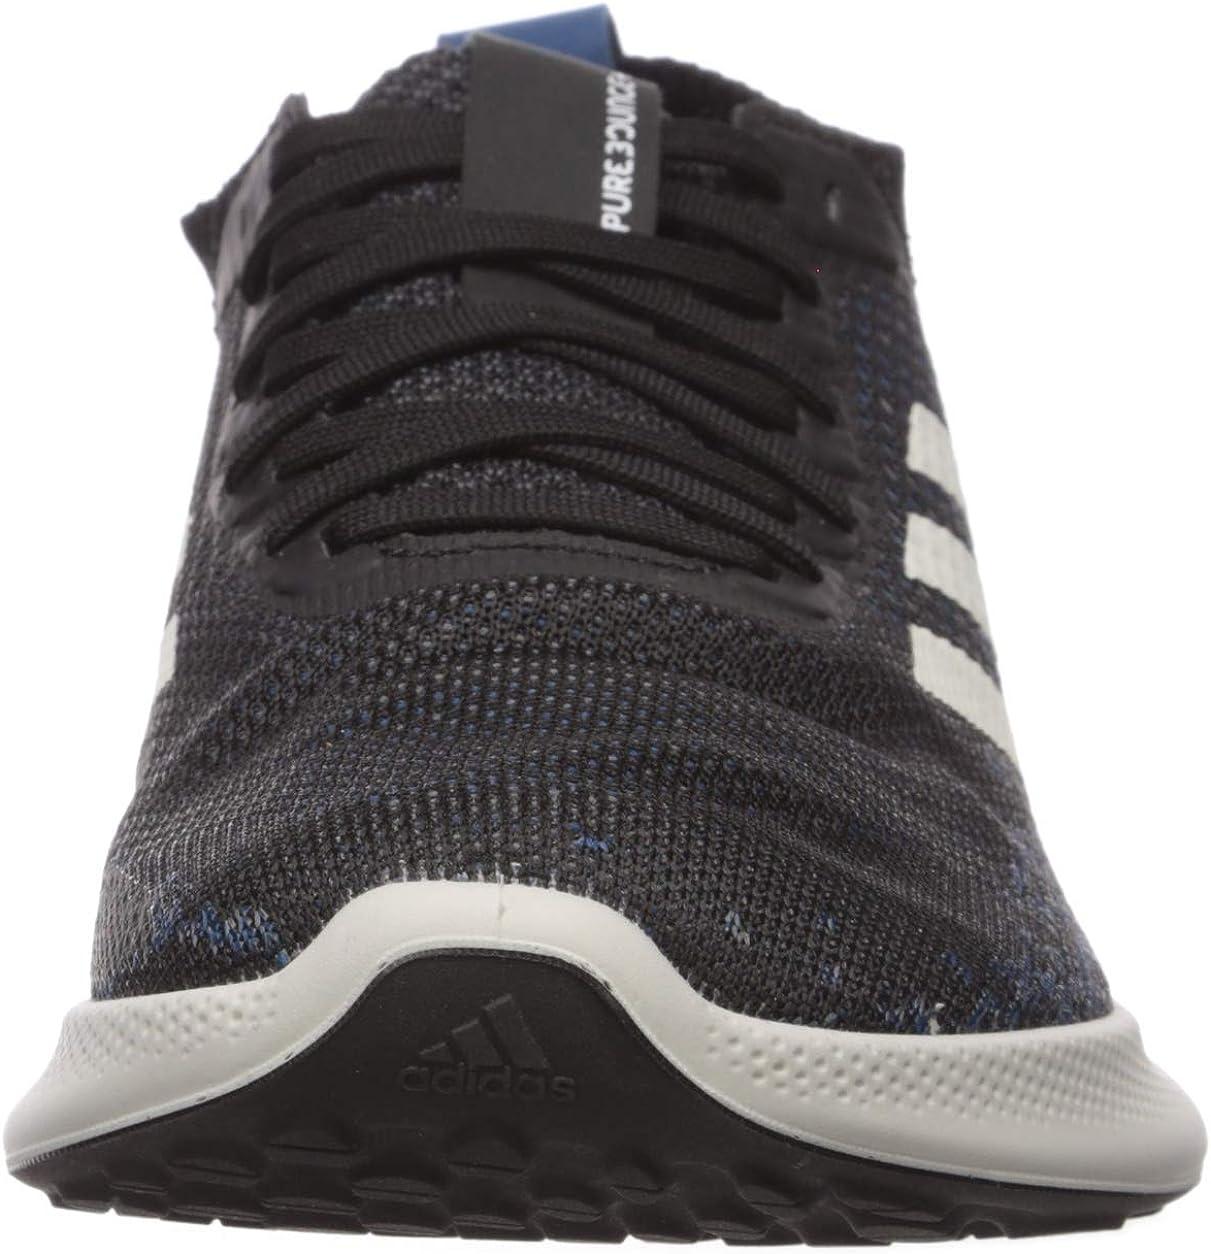 Adidas Purebounce + scarpe da corsa da uomo Nero Bianco Legend Marine